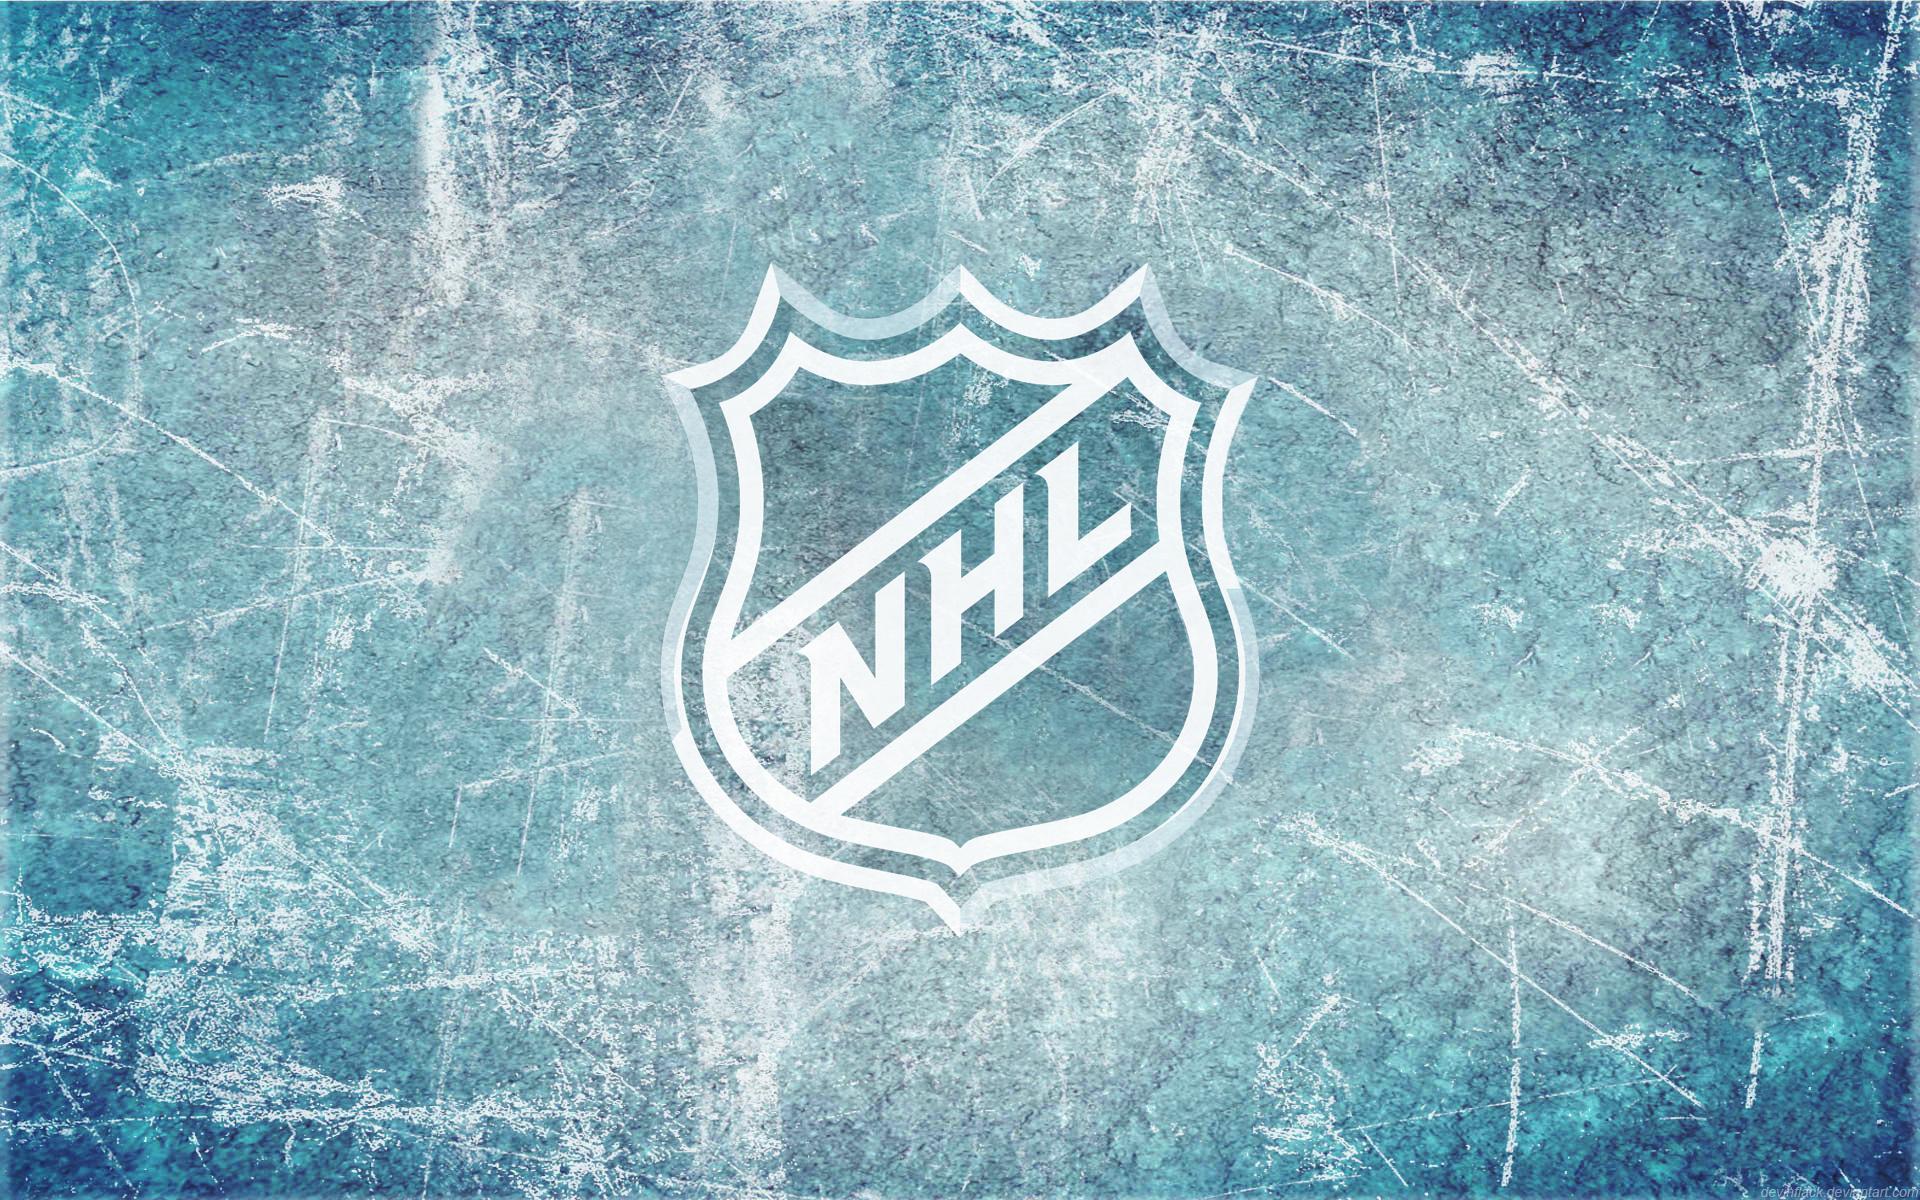 Ice hockey Wallpaper NHL Wallpaper 3 HD Desktop Wallpapers 1920x1200